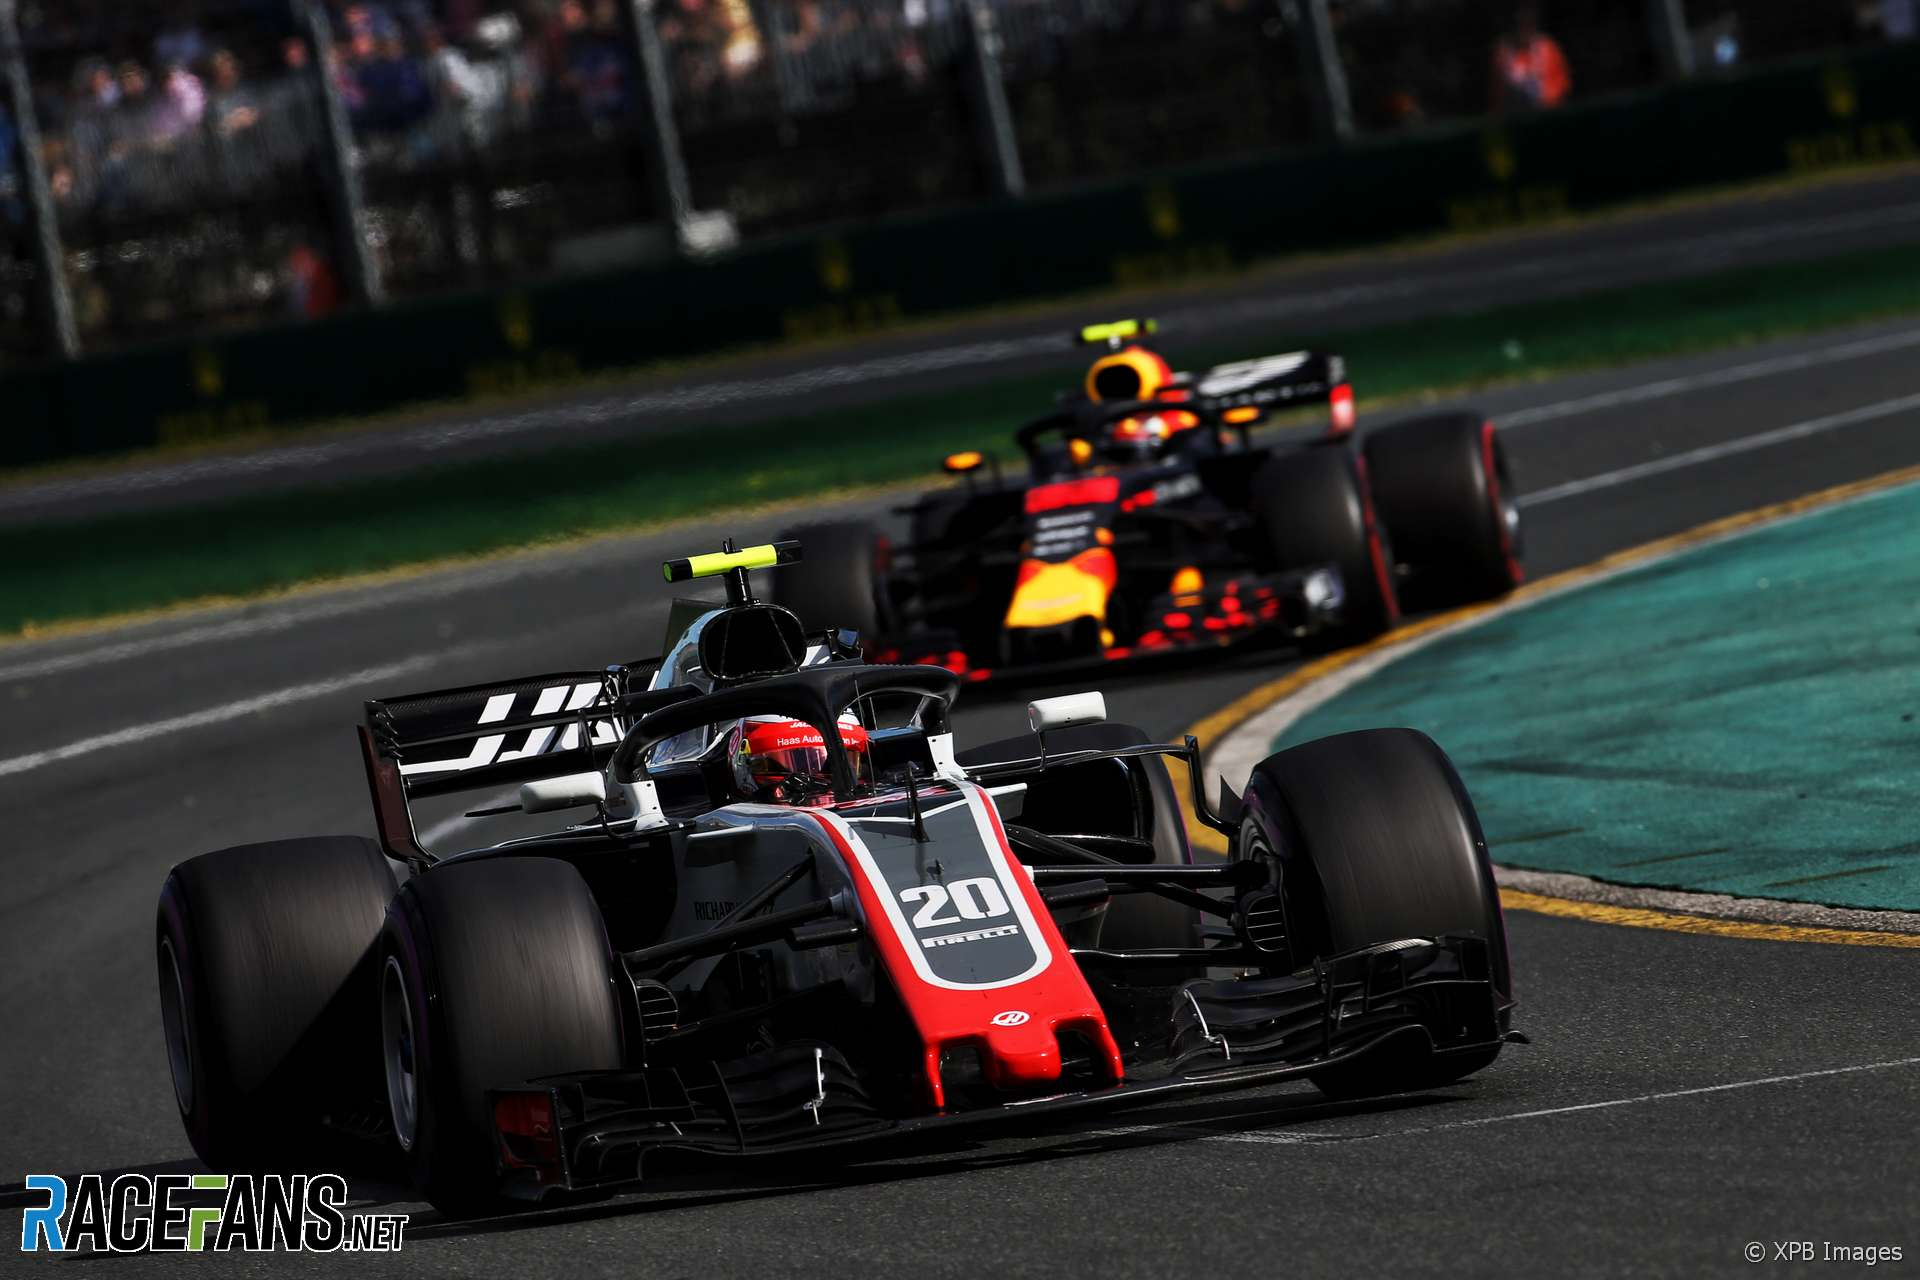 Kevin Magnussen, Haas, Albert Park, 2018